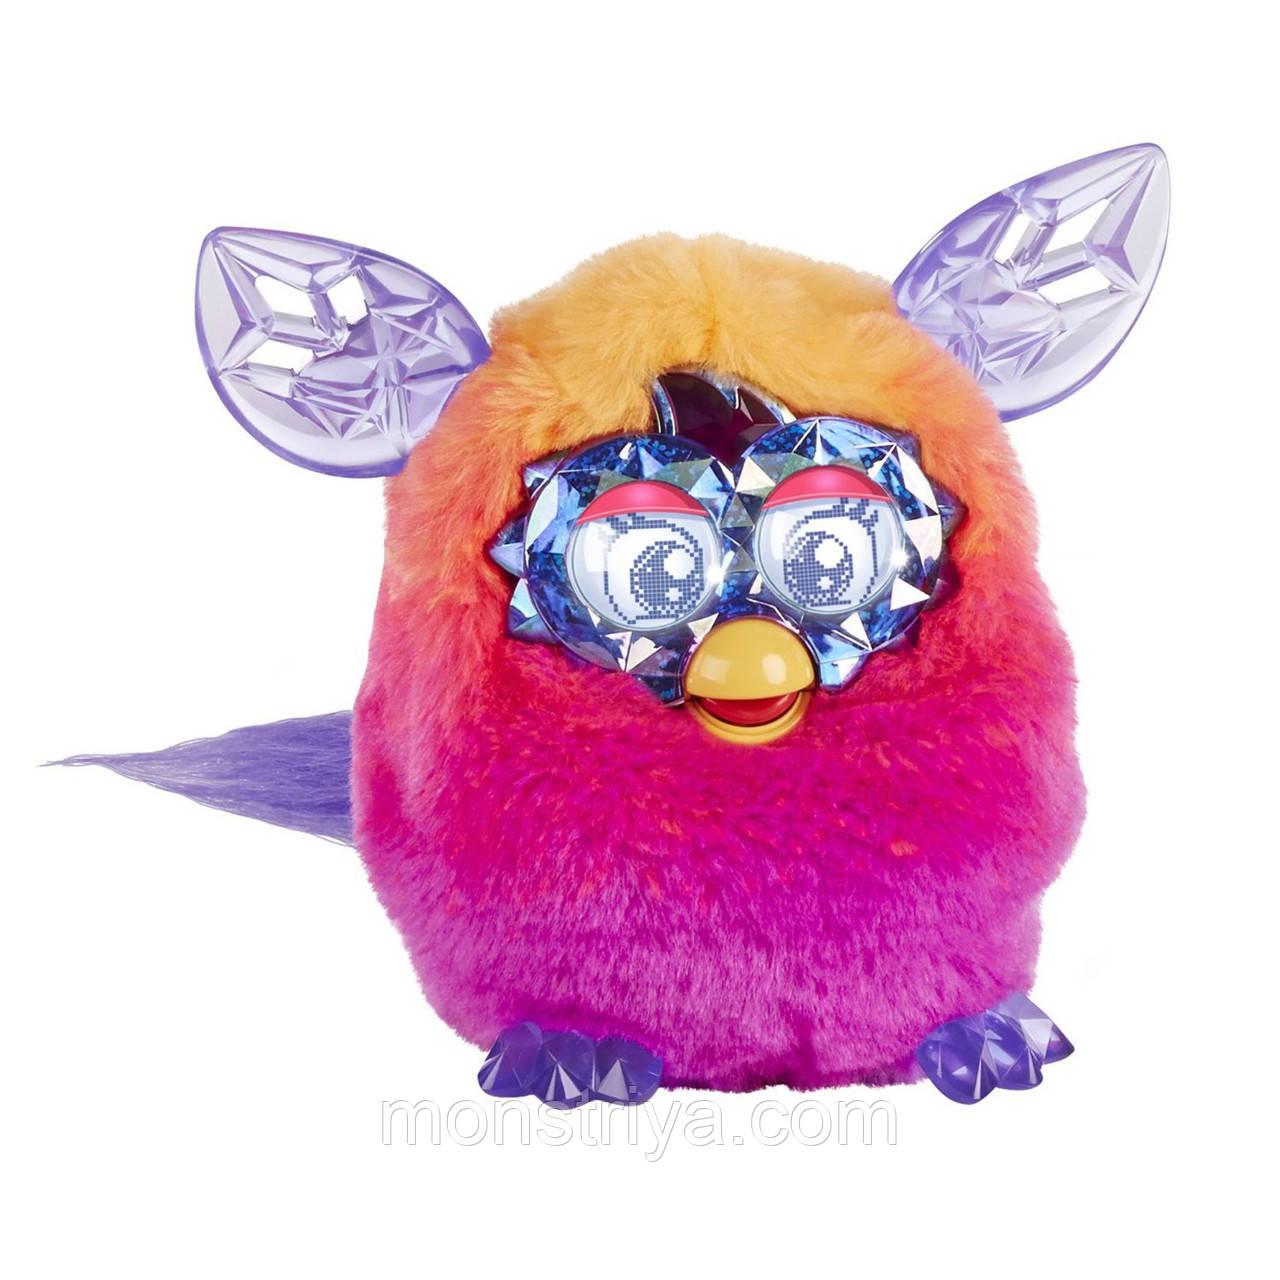 Интерактивная игрушка Furby Boom Crystal Series, Фёрби Кристал. Ферби Бум